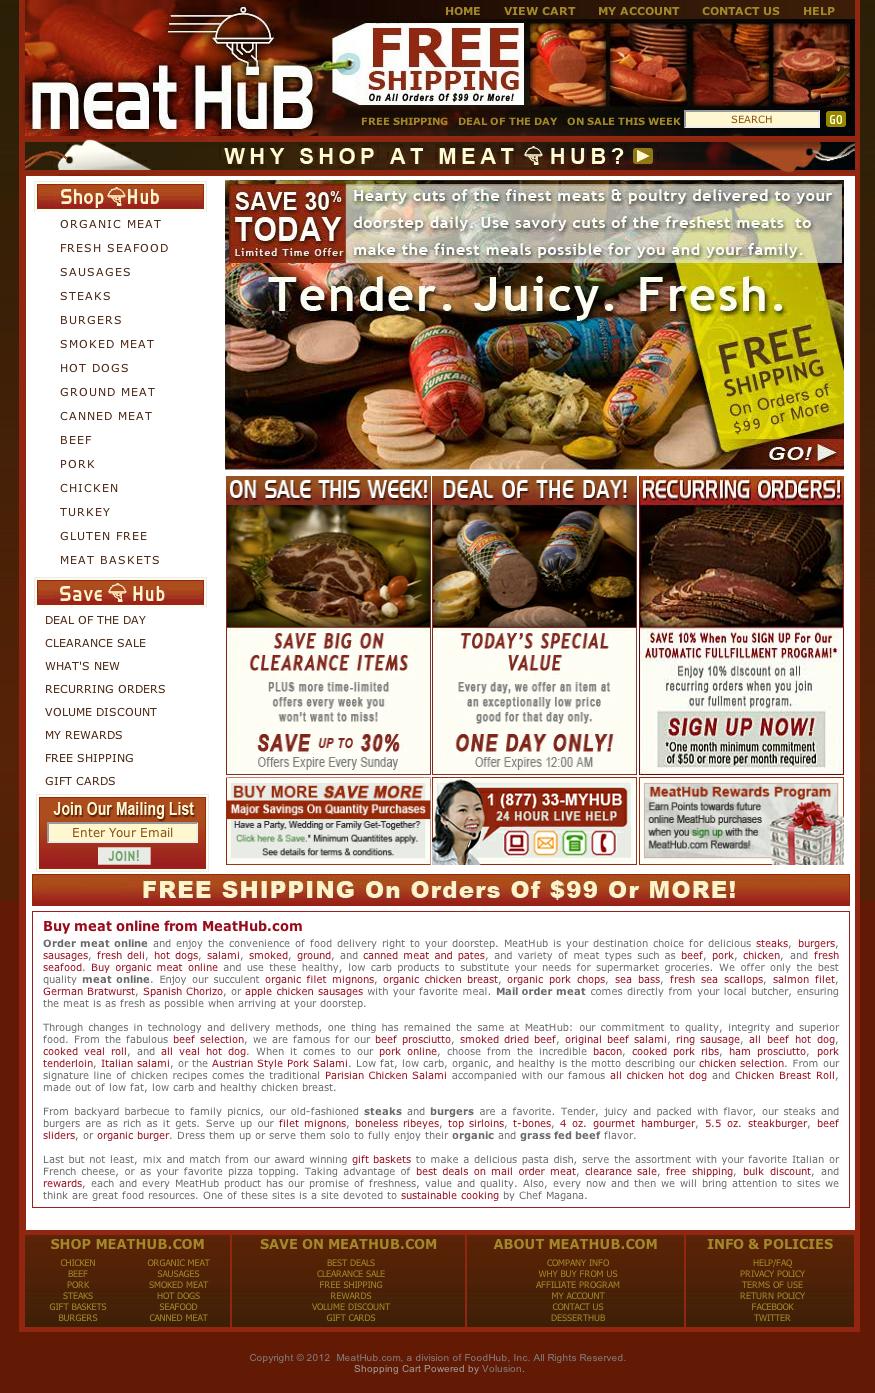 www.meathub.com